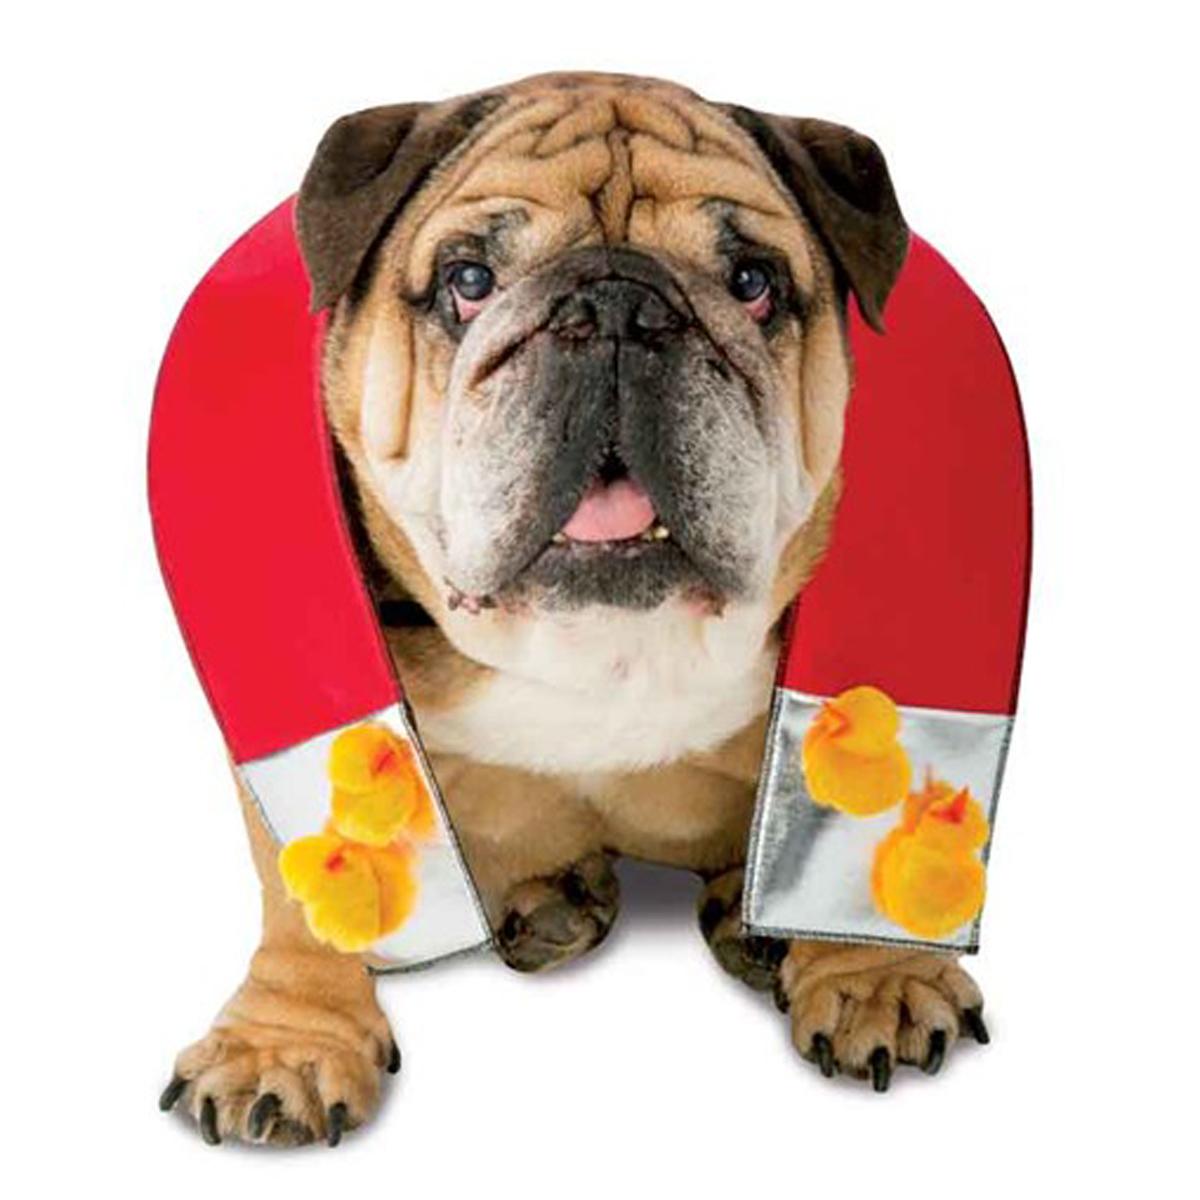 Zelda Chick Magnet Halloween Dog Costume